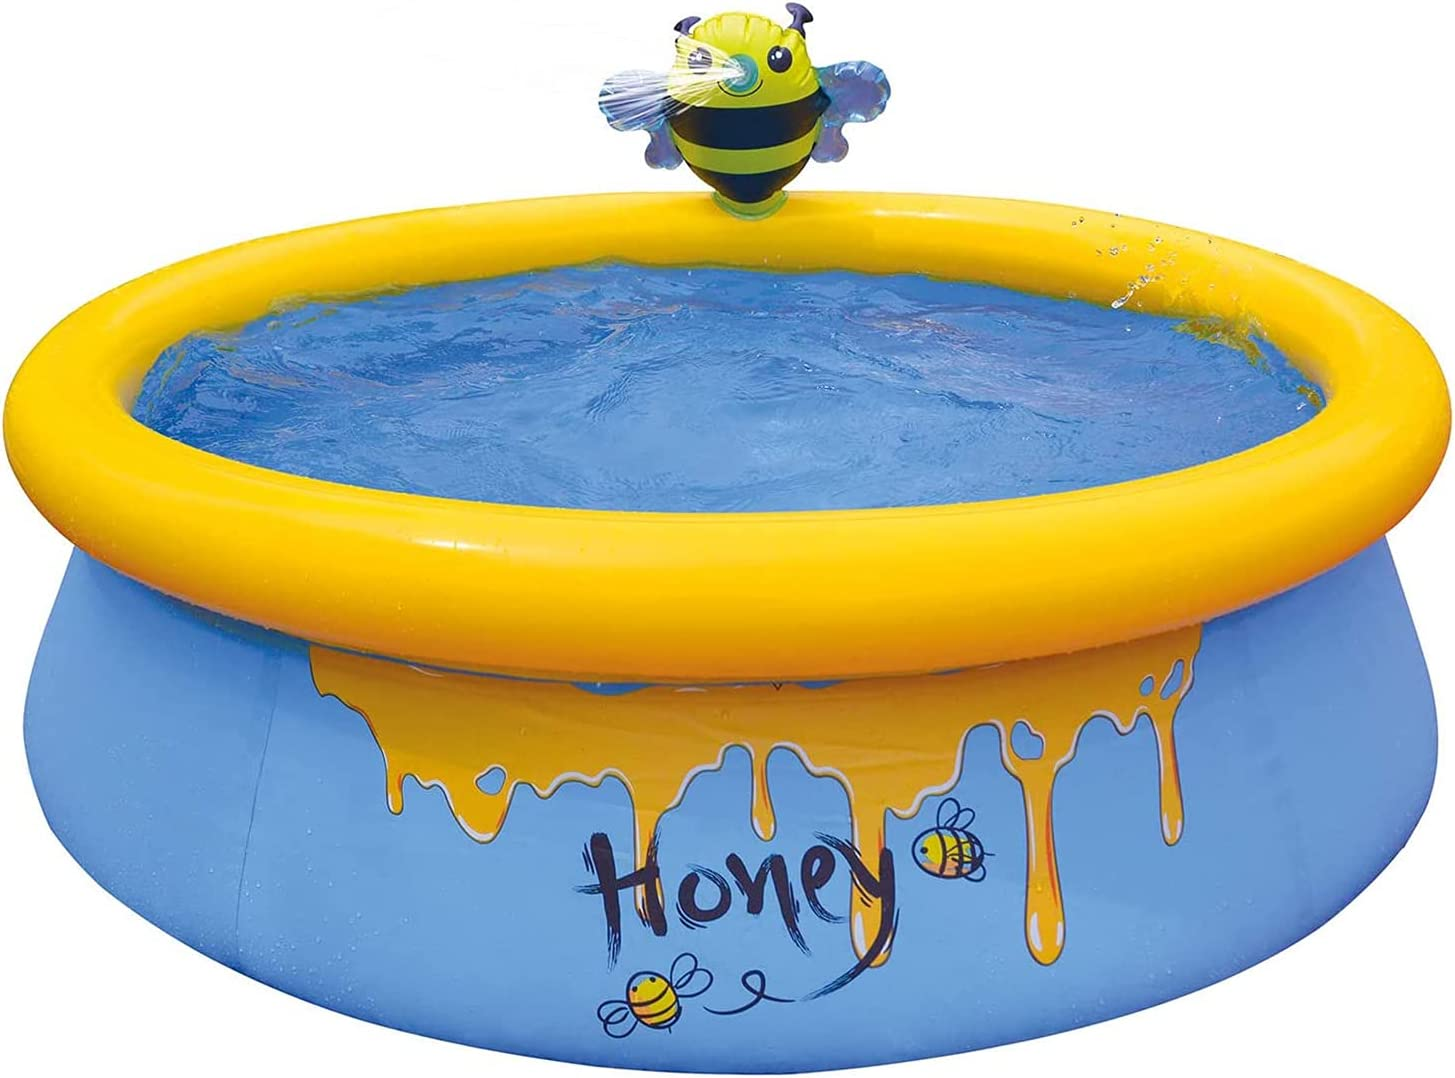 YEHEI free Honeybee Translated Inflatable Pool Family Swimming